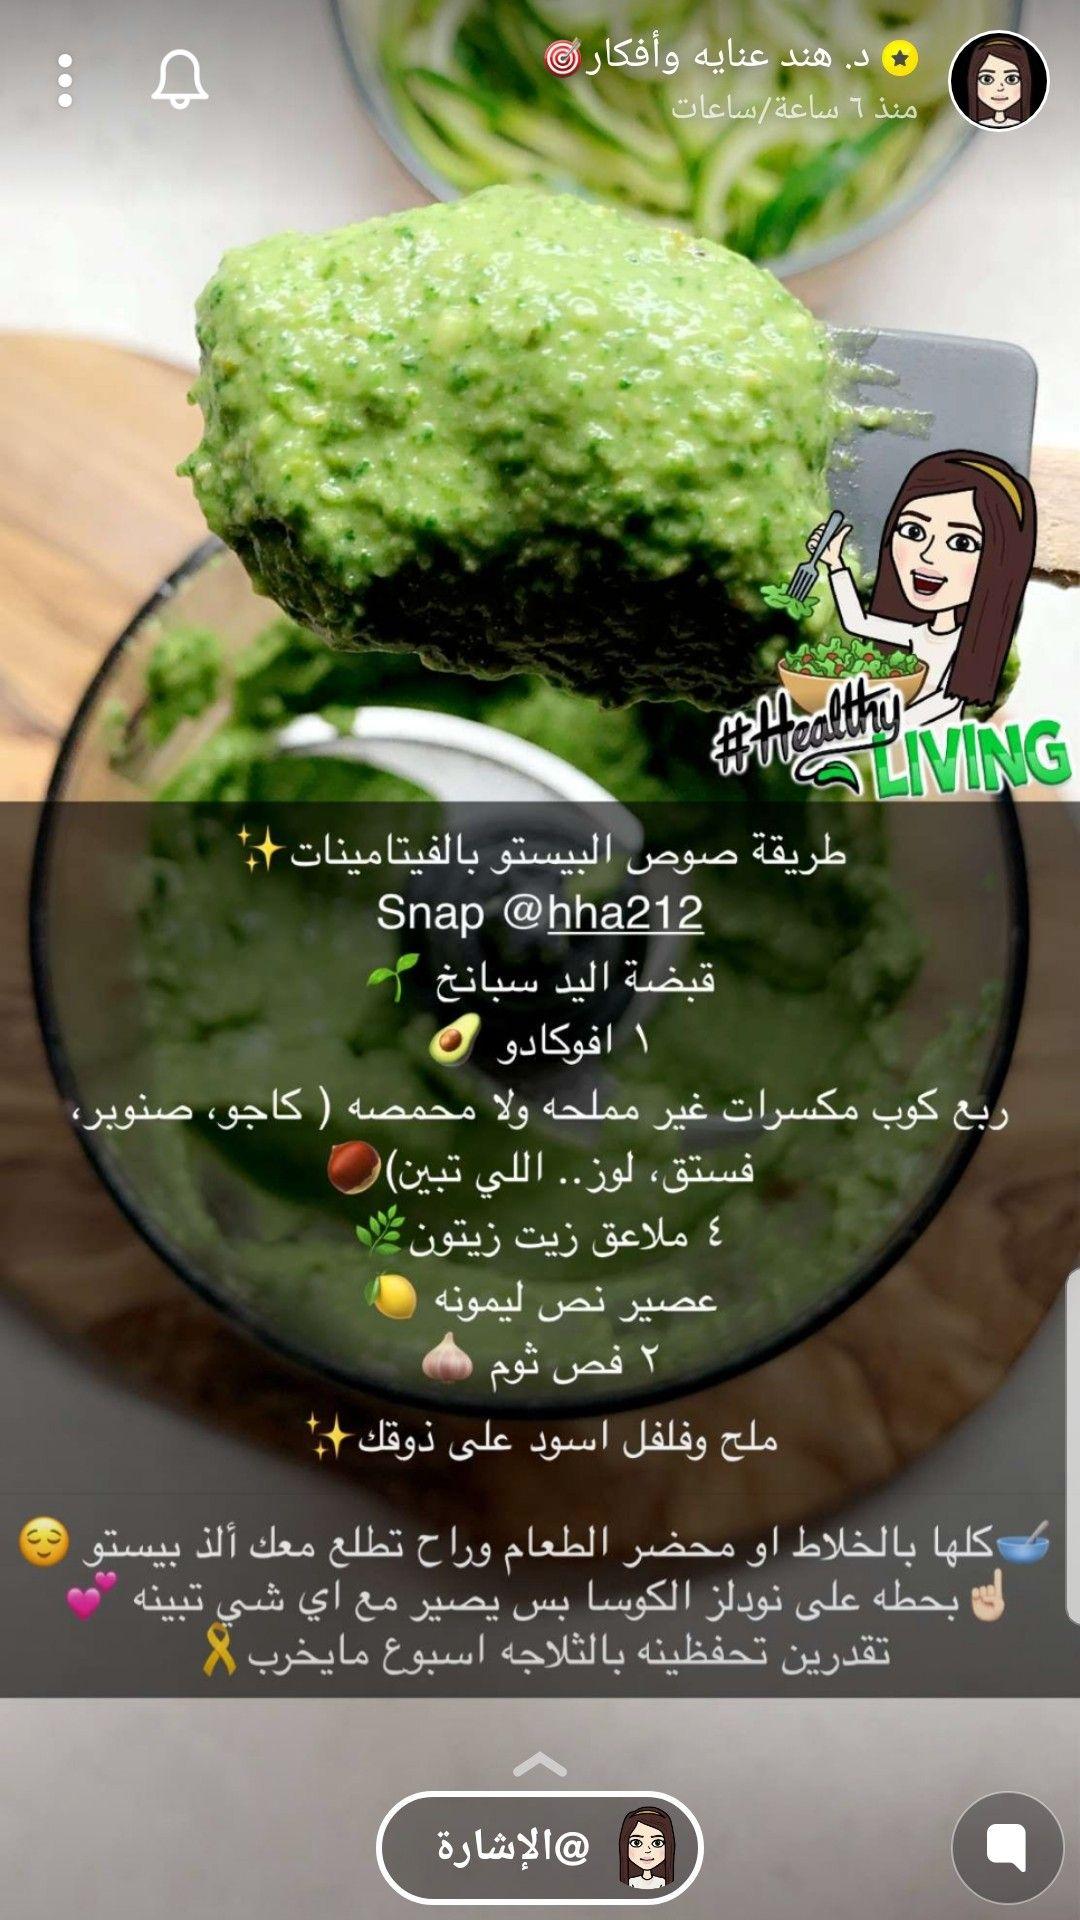 Pin By Mori Chan On صحي Healthy Snacks Recipes Healthy Foodie Yummy Food Dessert